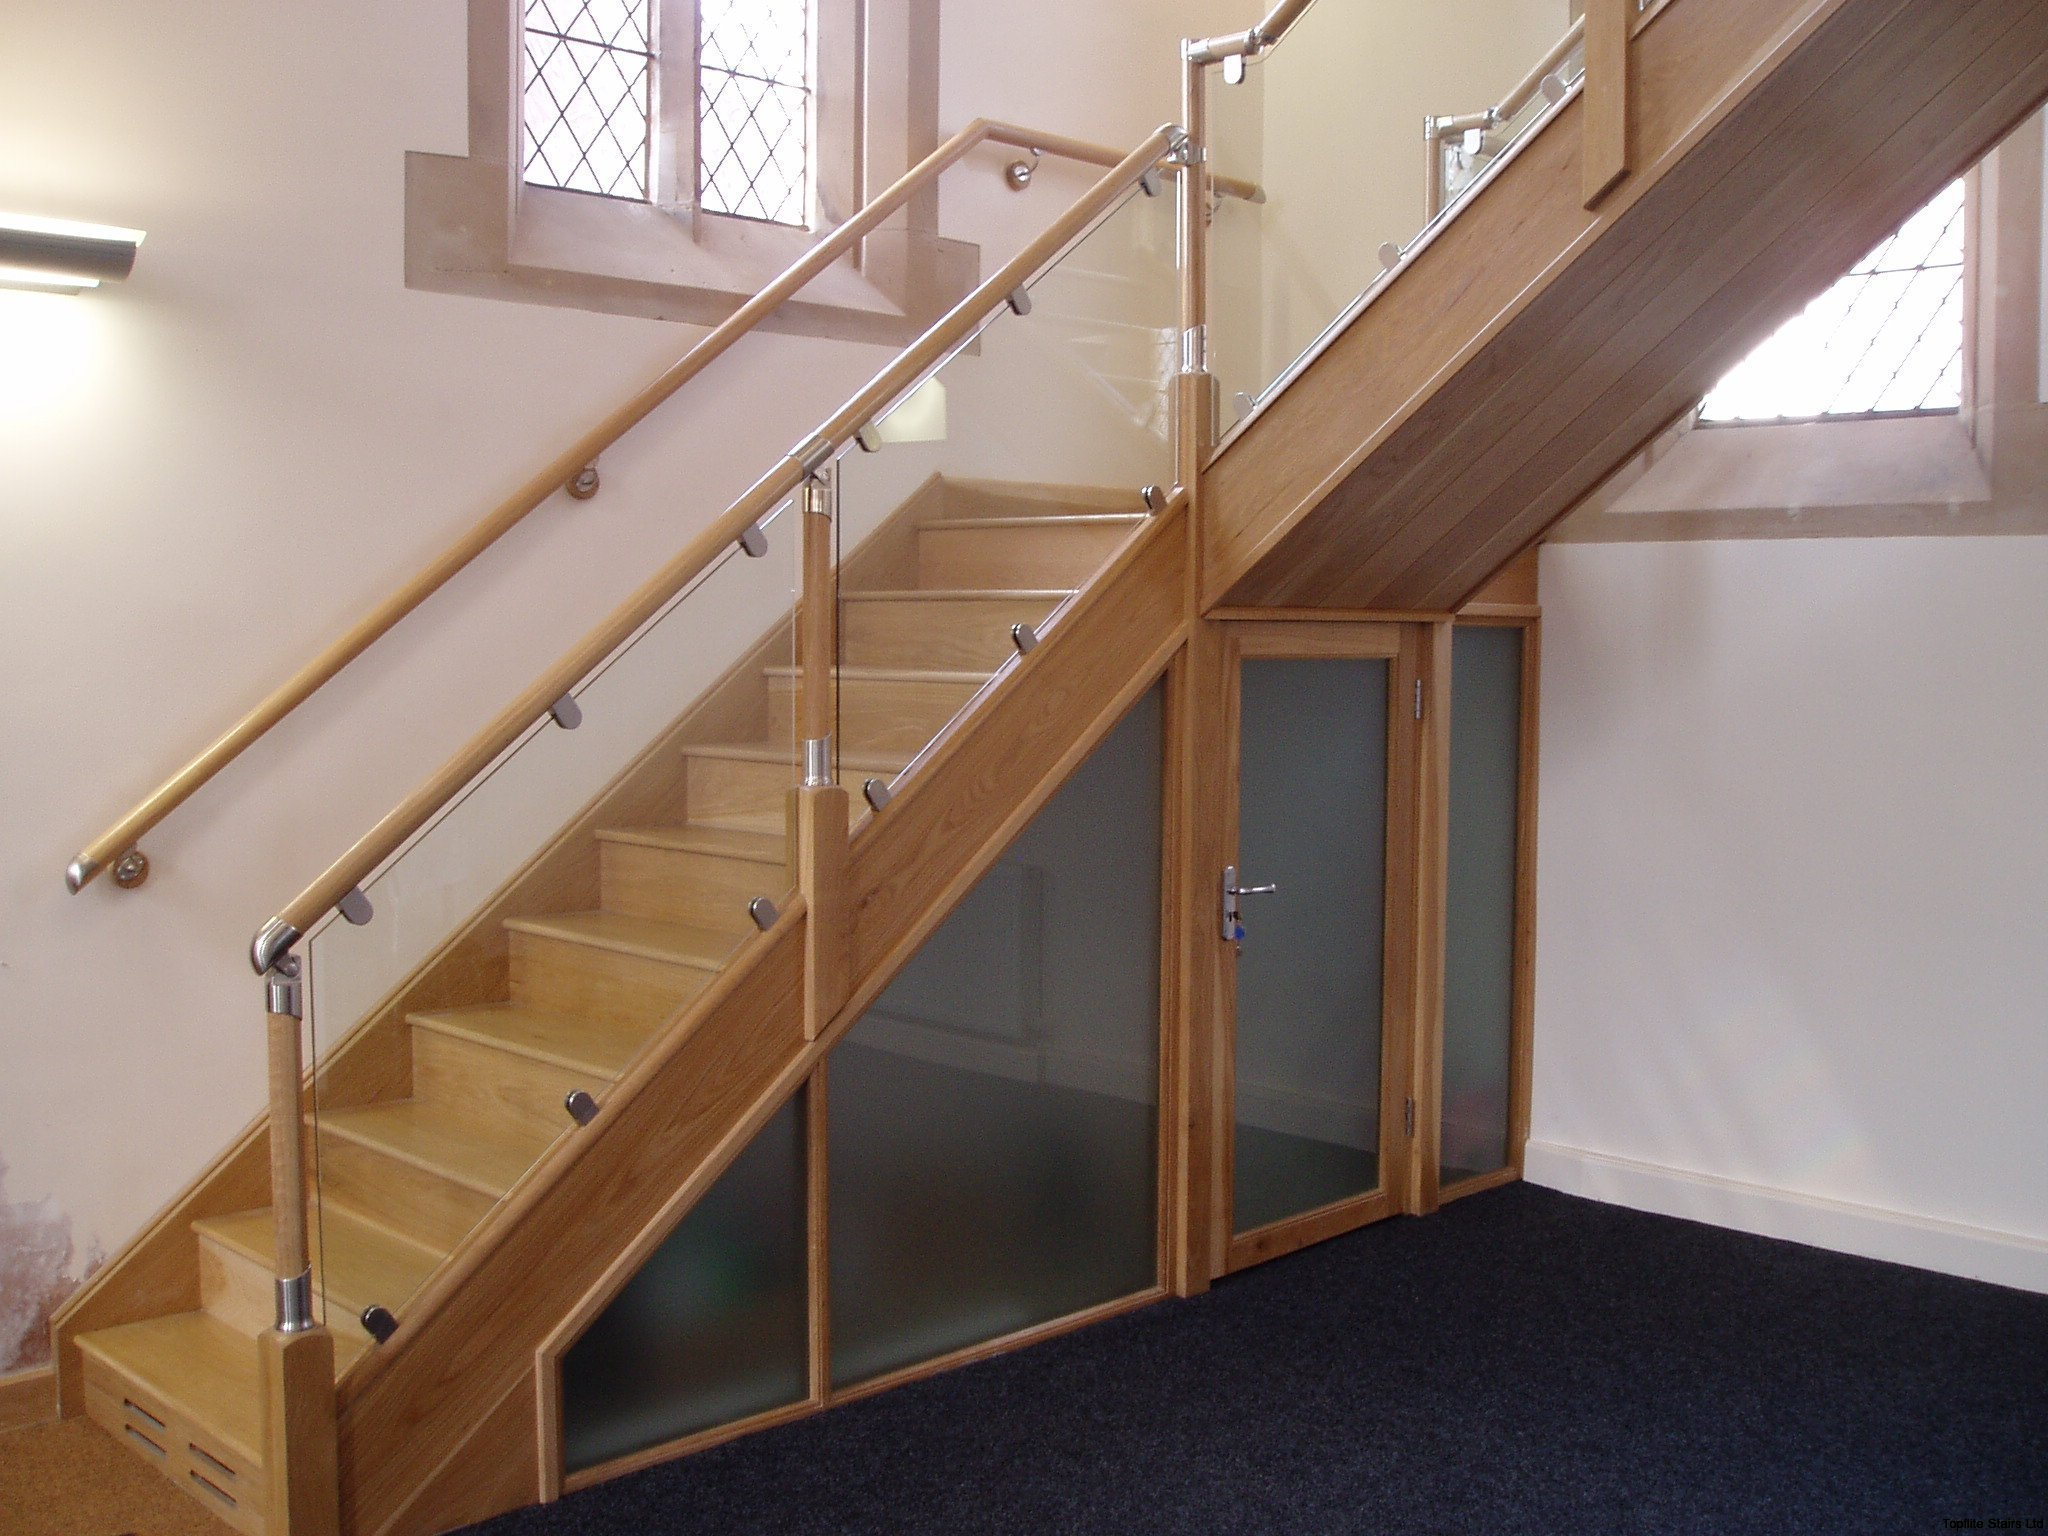 Glass Balustrade Staircase Gallery Topflite Stairs Ltd